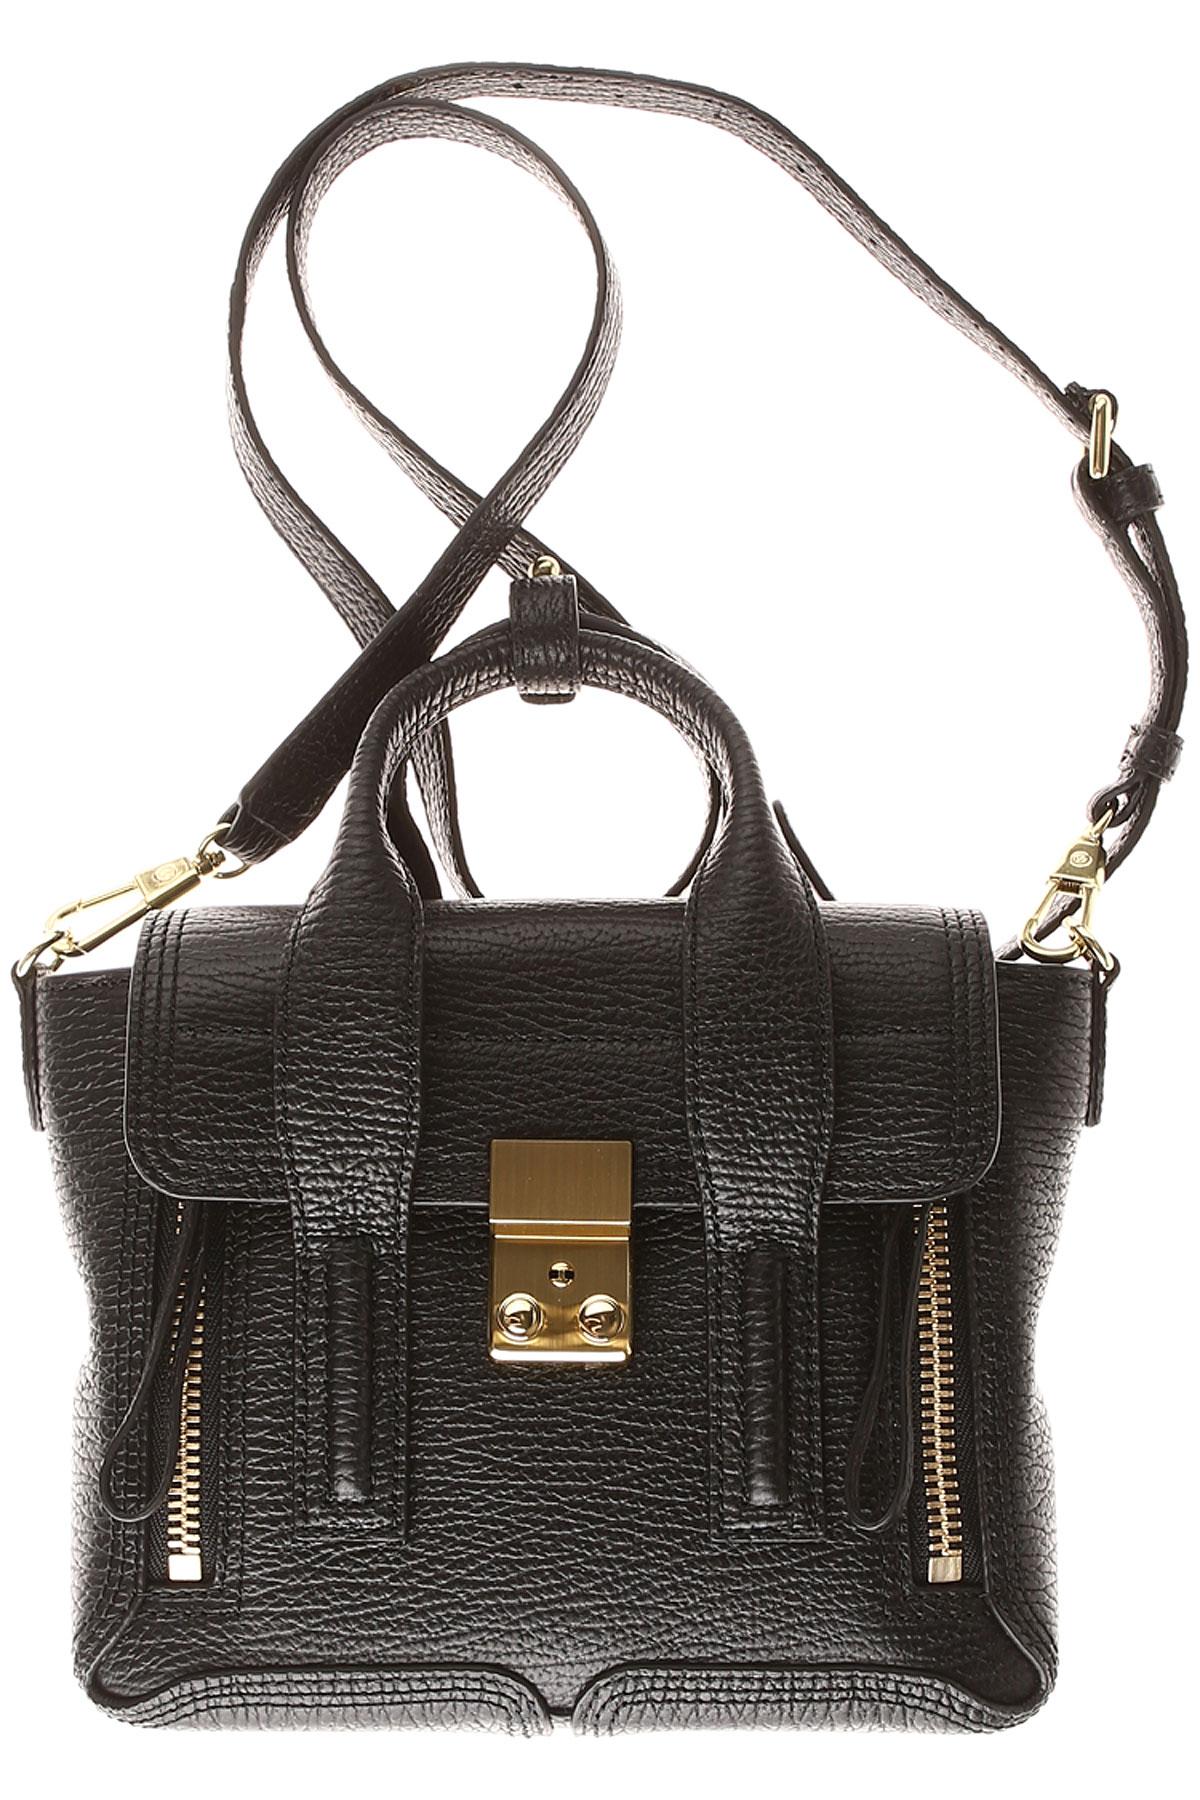 Image of 3.1 PHILLIP LIM Top Handle Handbag, Black, Leather, 2017